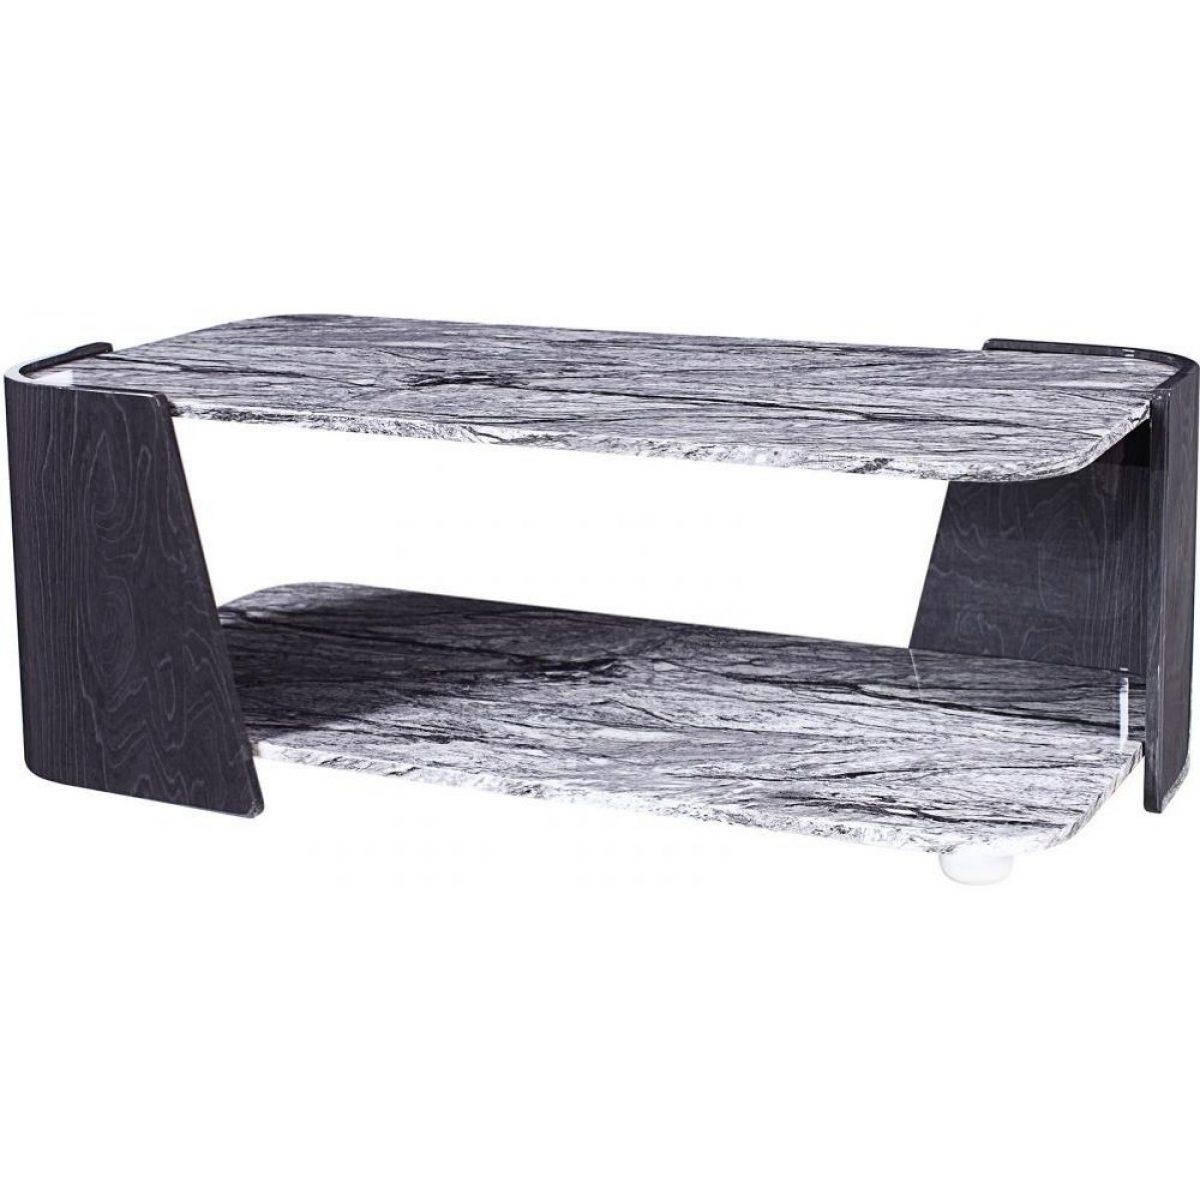 Jual Jf907 Sorrento Coffee Table High Gloss Grey Slate Marble Effect